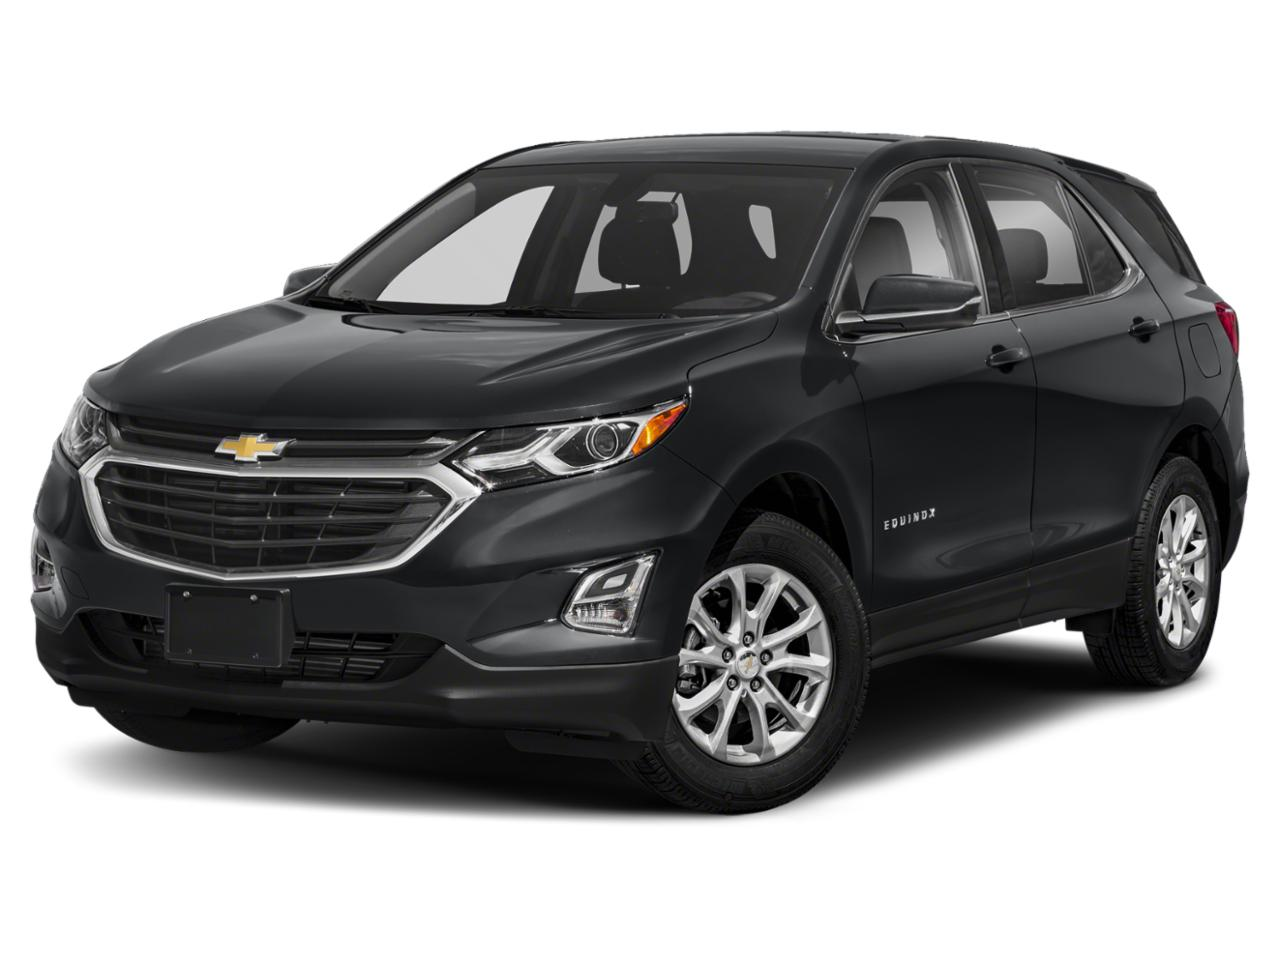 2018 Chevrolet Equinox Vehicle Photo in Rockville, MD 20852